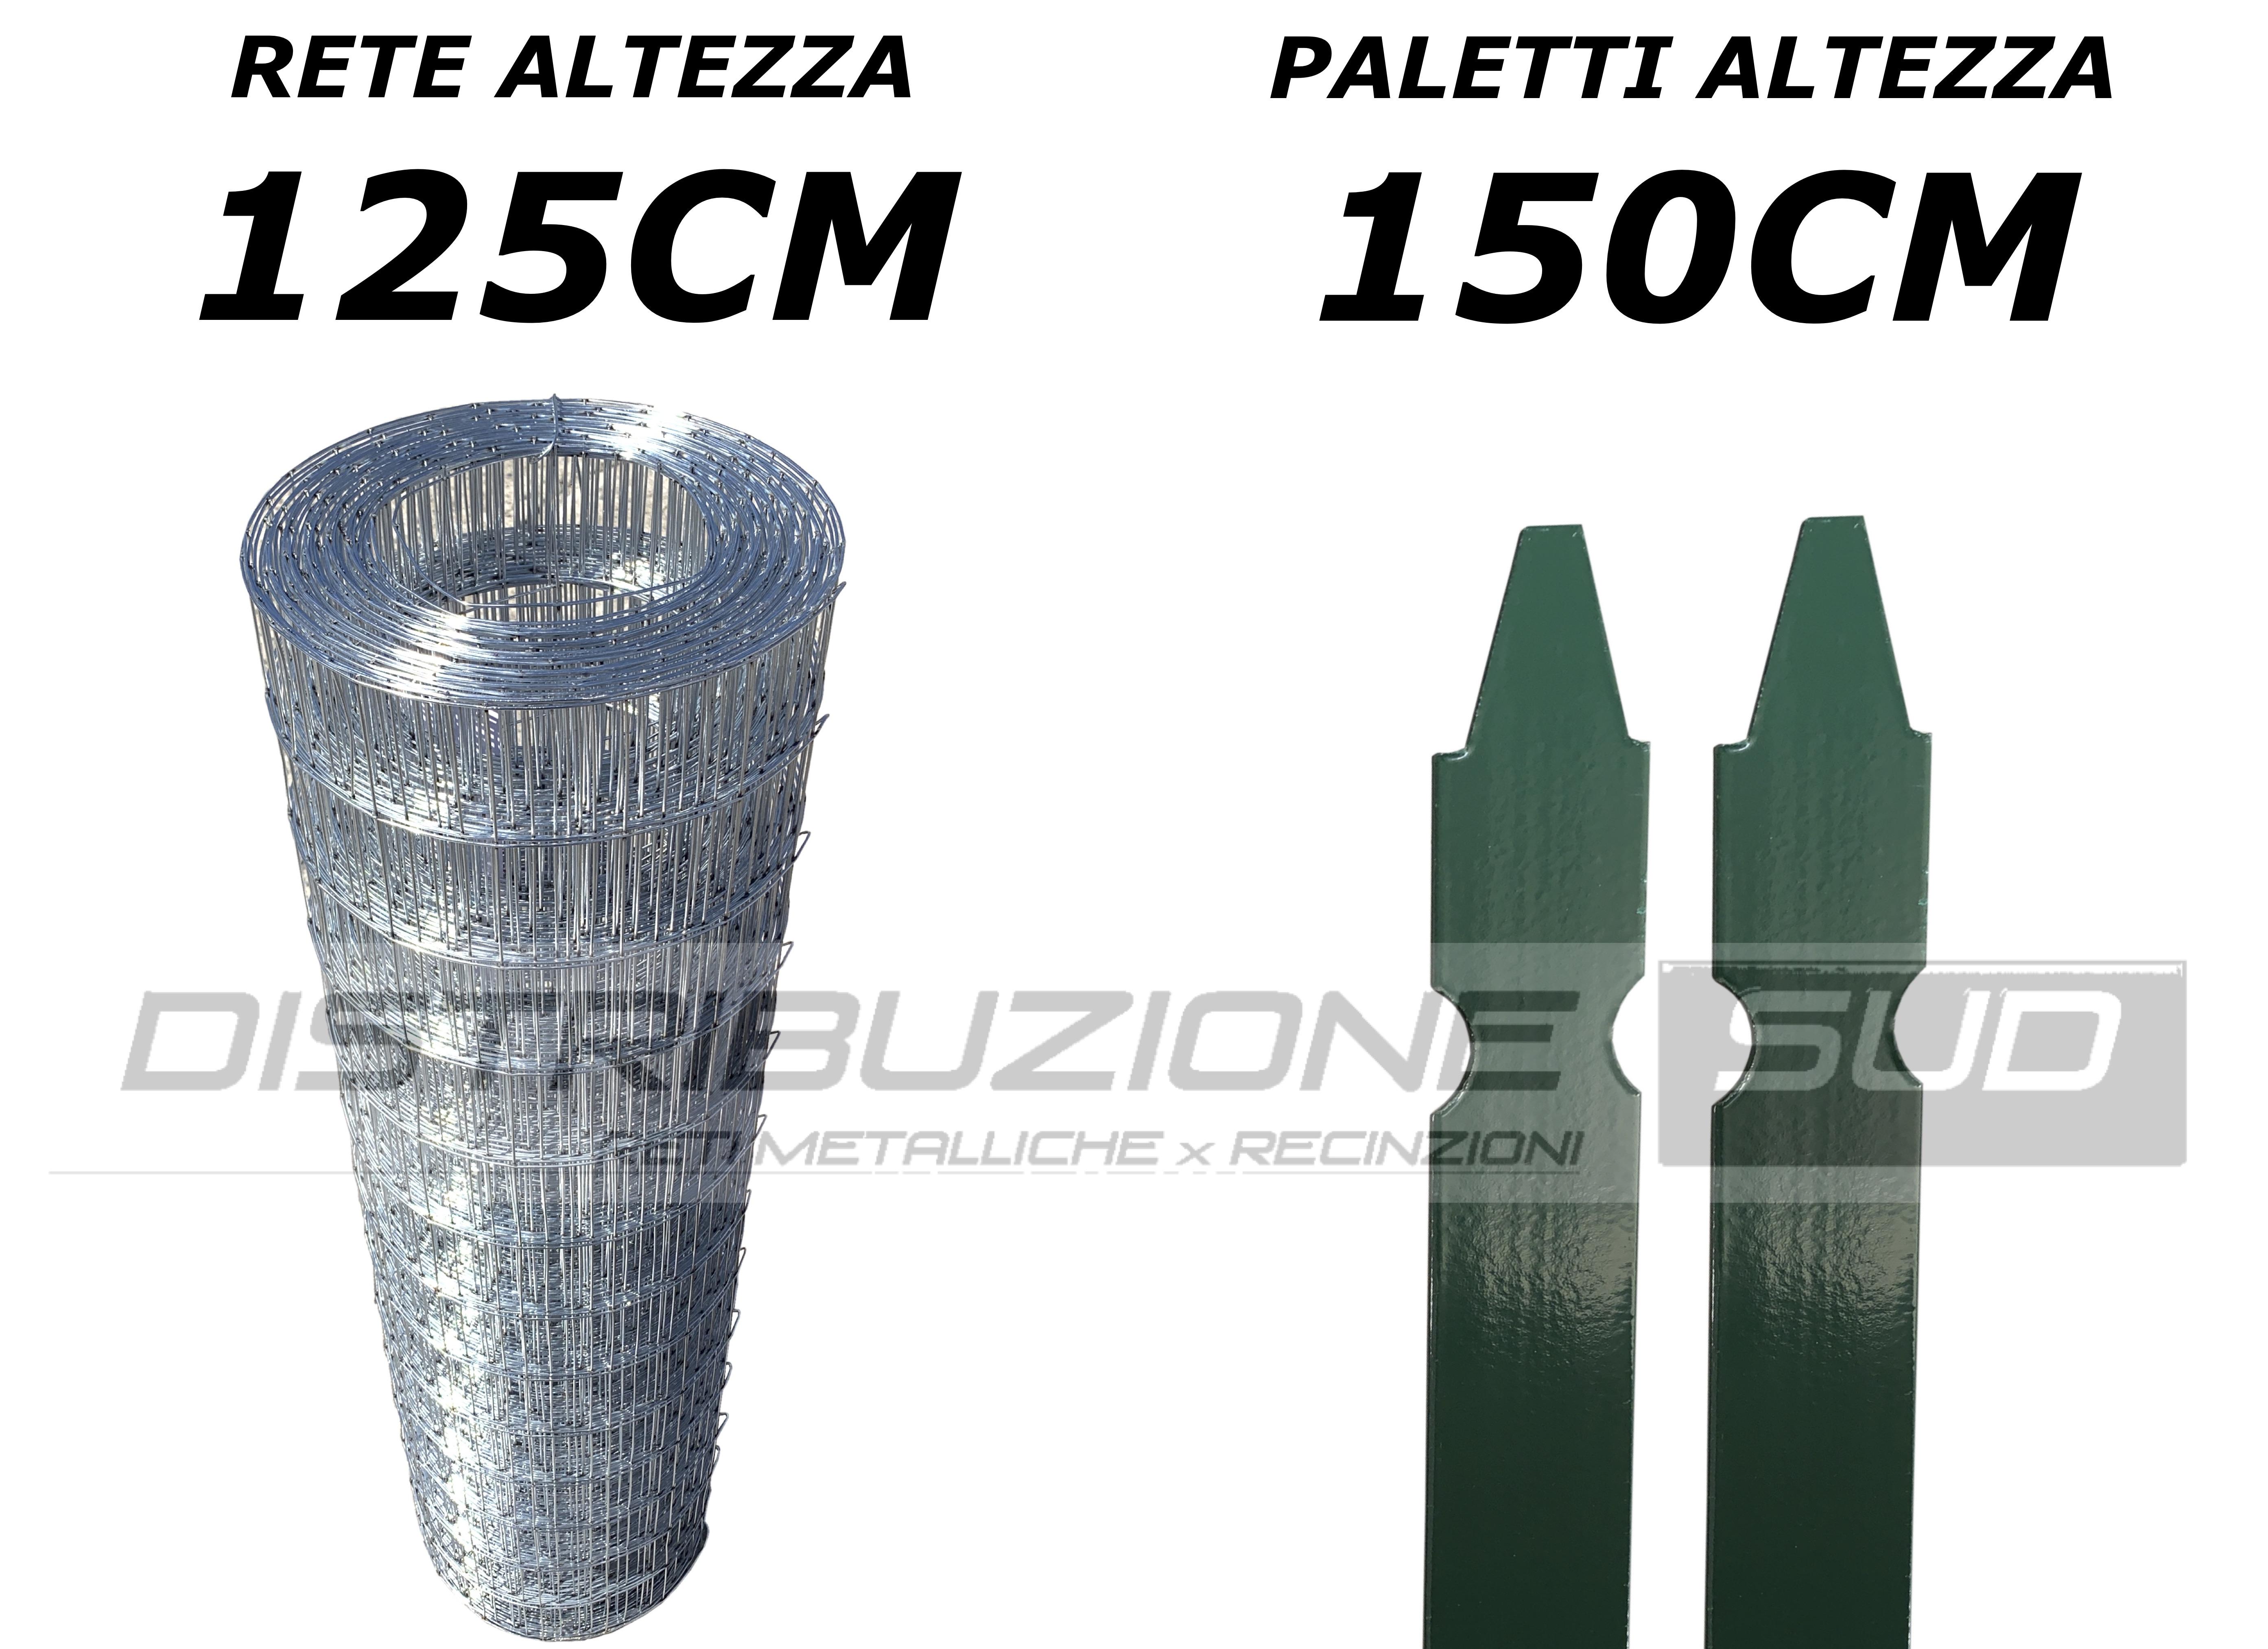 kit rete 5x7 zincata con pali plastificati